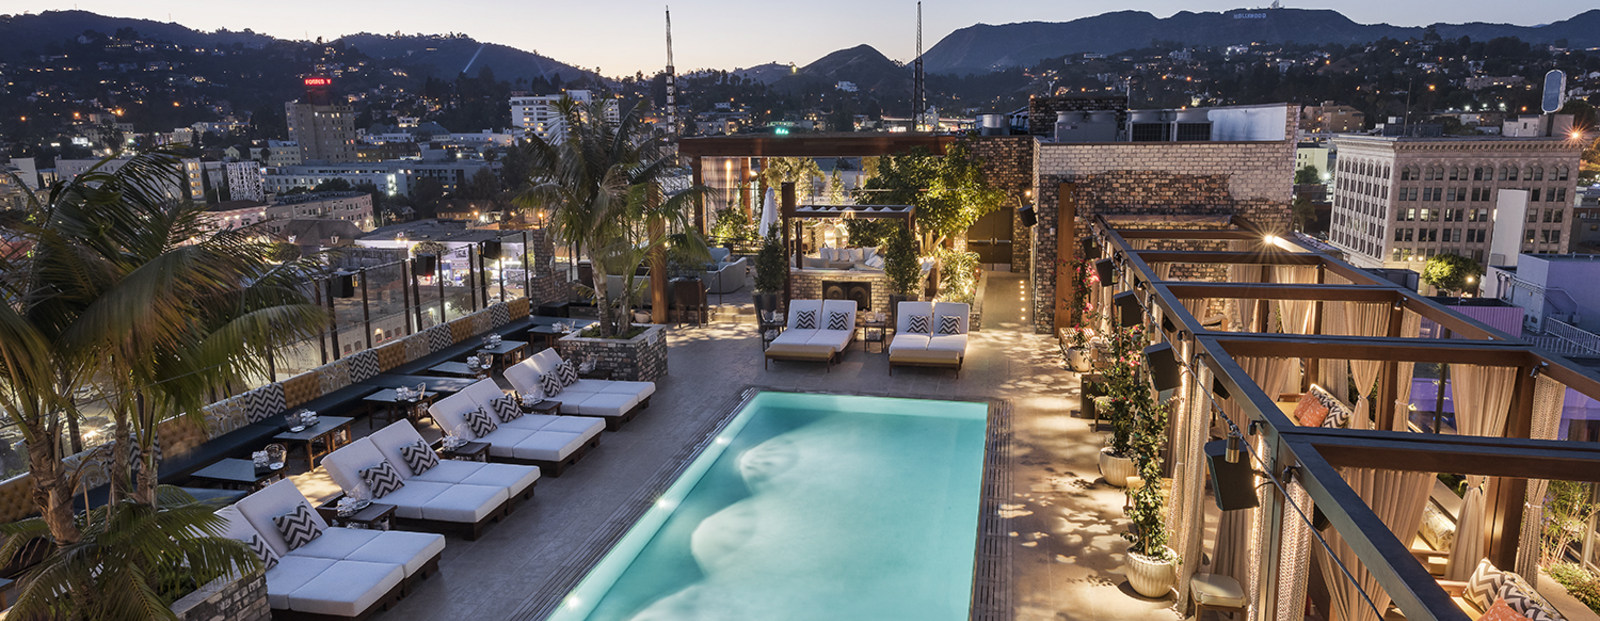 Dream Hollywood Hotel Usa Spiralift